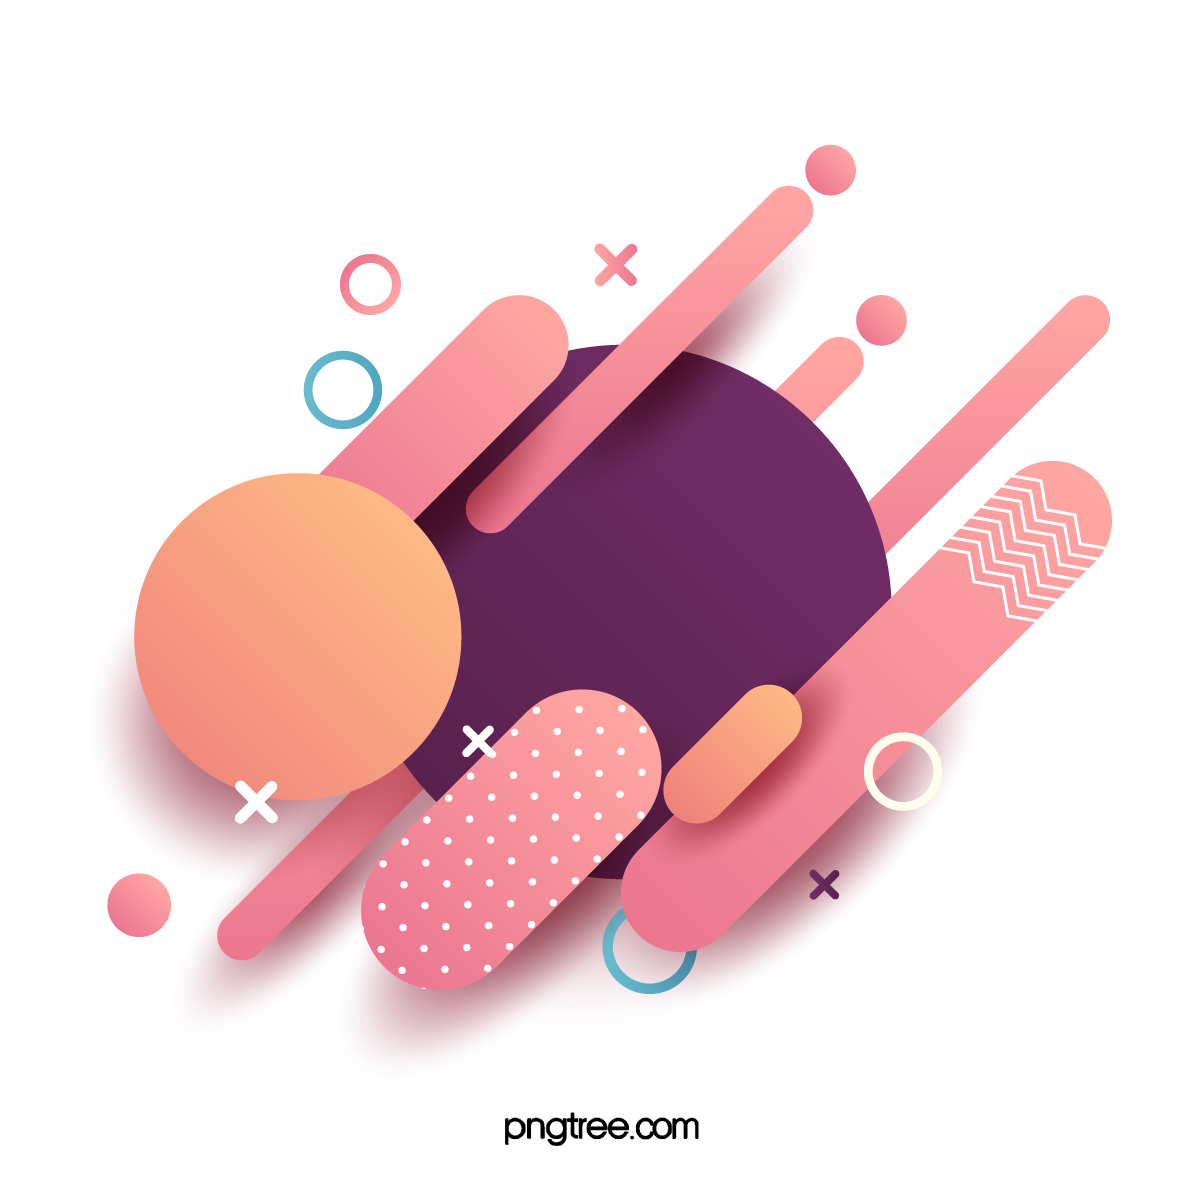 —Pngtree—abstract minimalistic geometric layered border_4975036